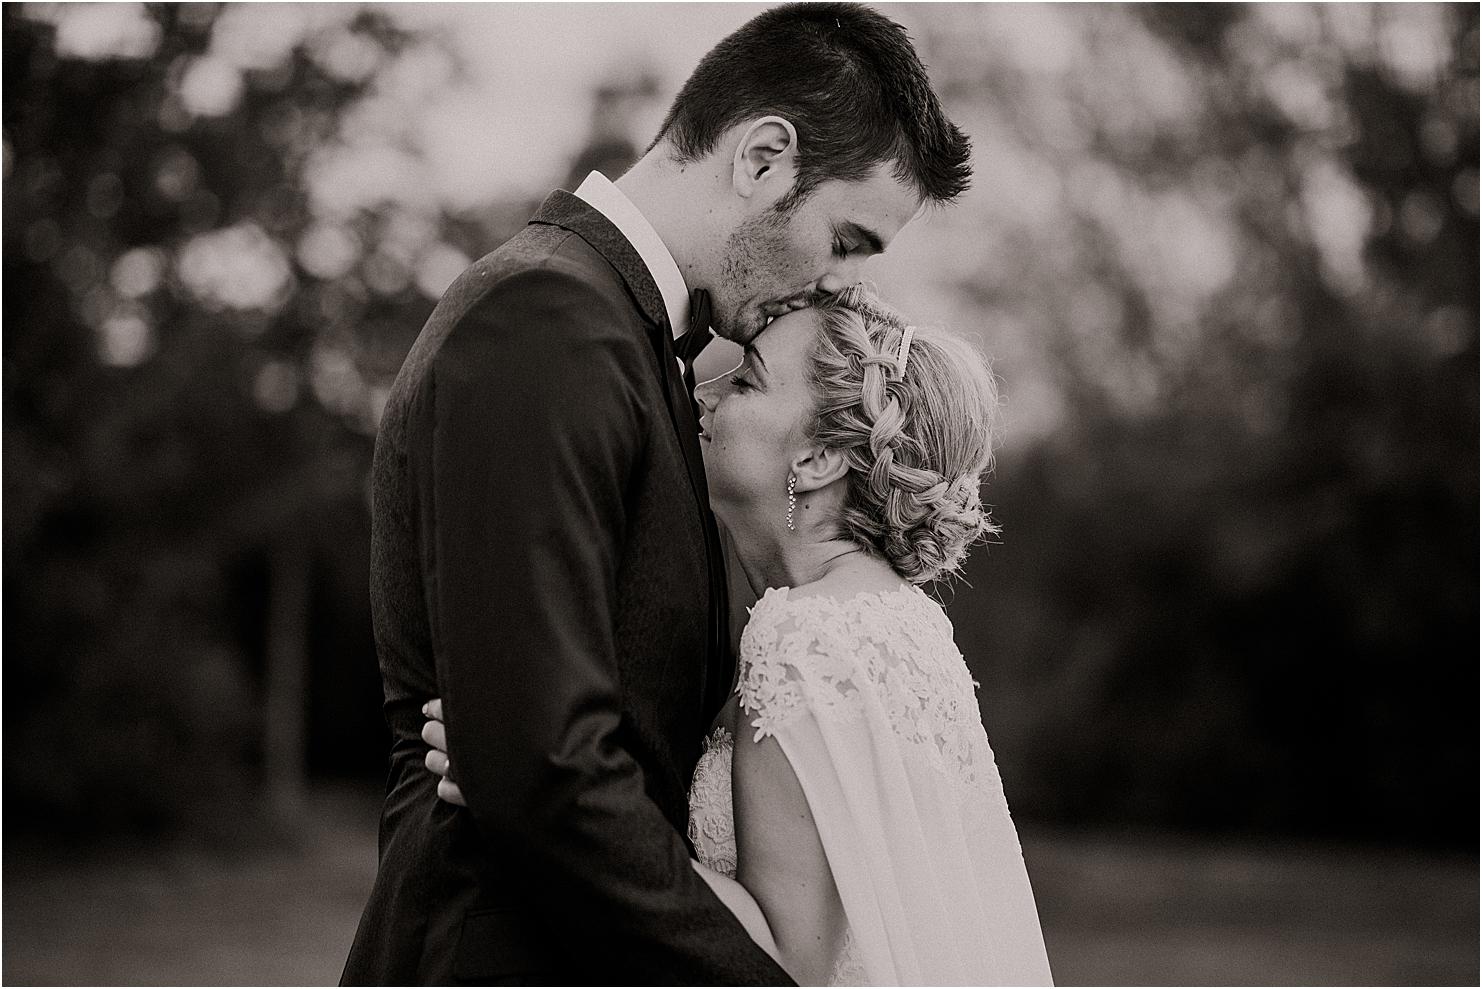 boda en tarragona fotografo de bodas tarragona bodas bonitas en tarragona